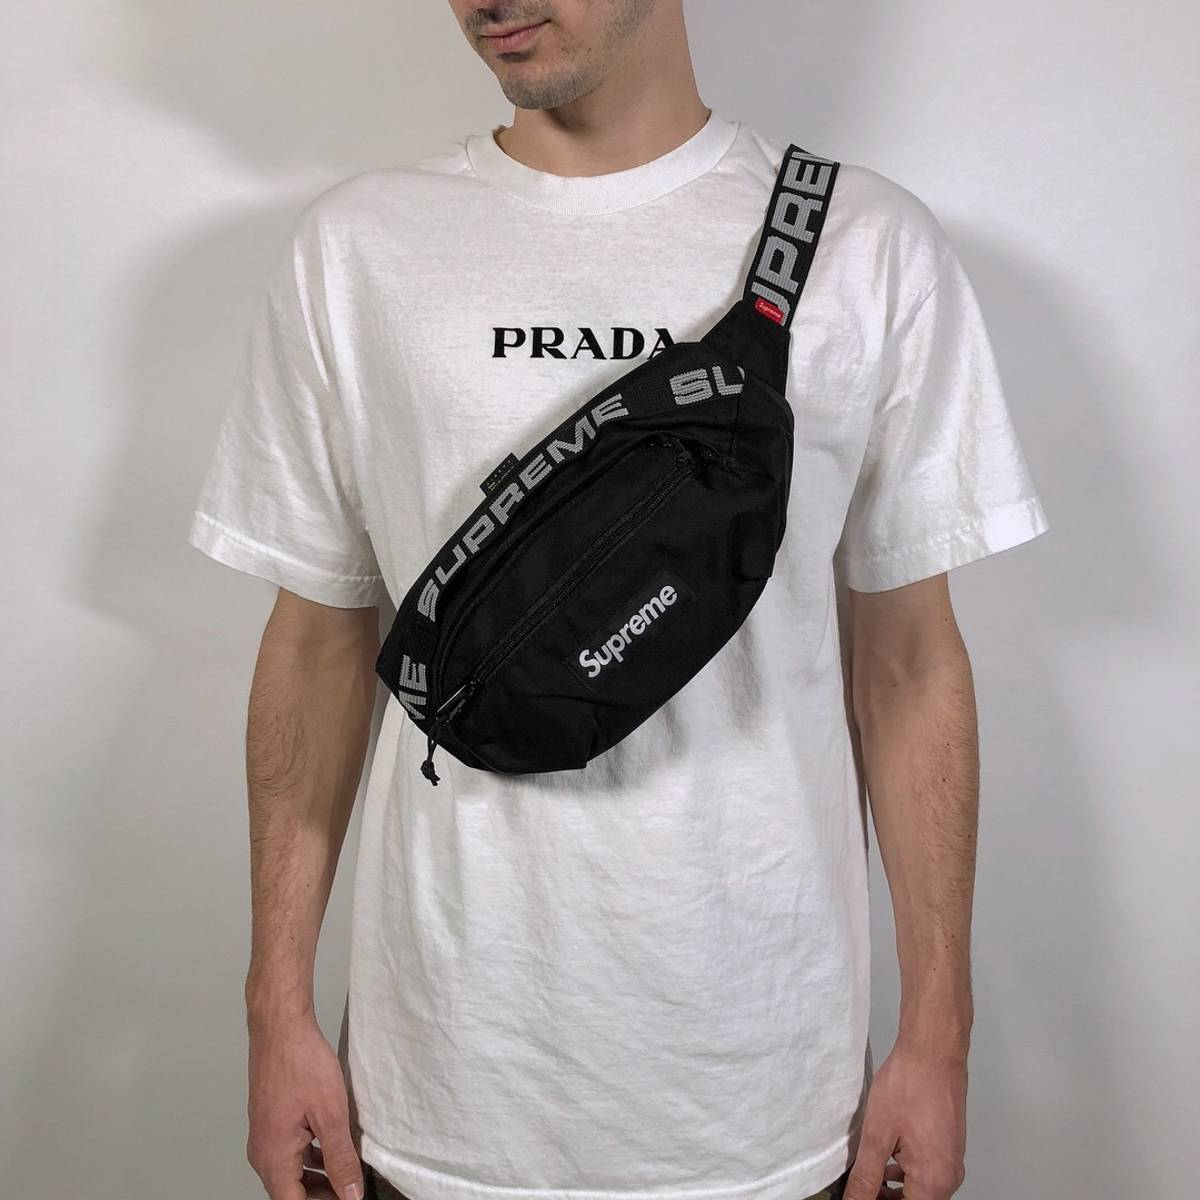 Supreme 🎱🎱 Nwt Supreme Ss18 Black Fanny Pack Cross-body Waistbag